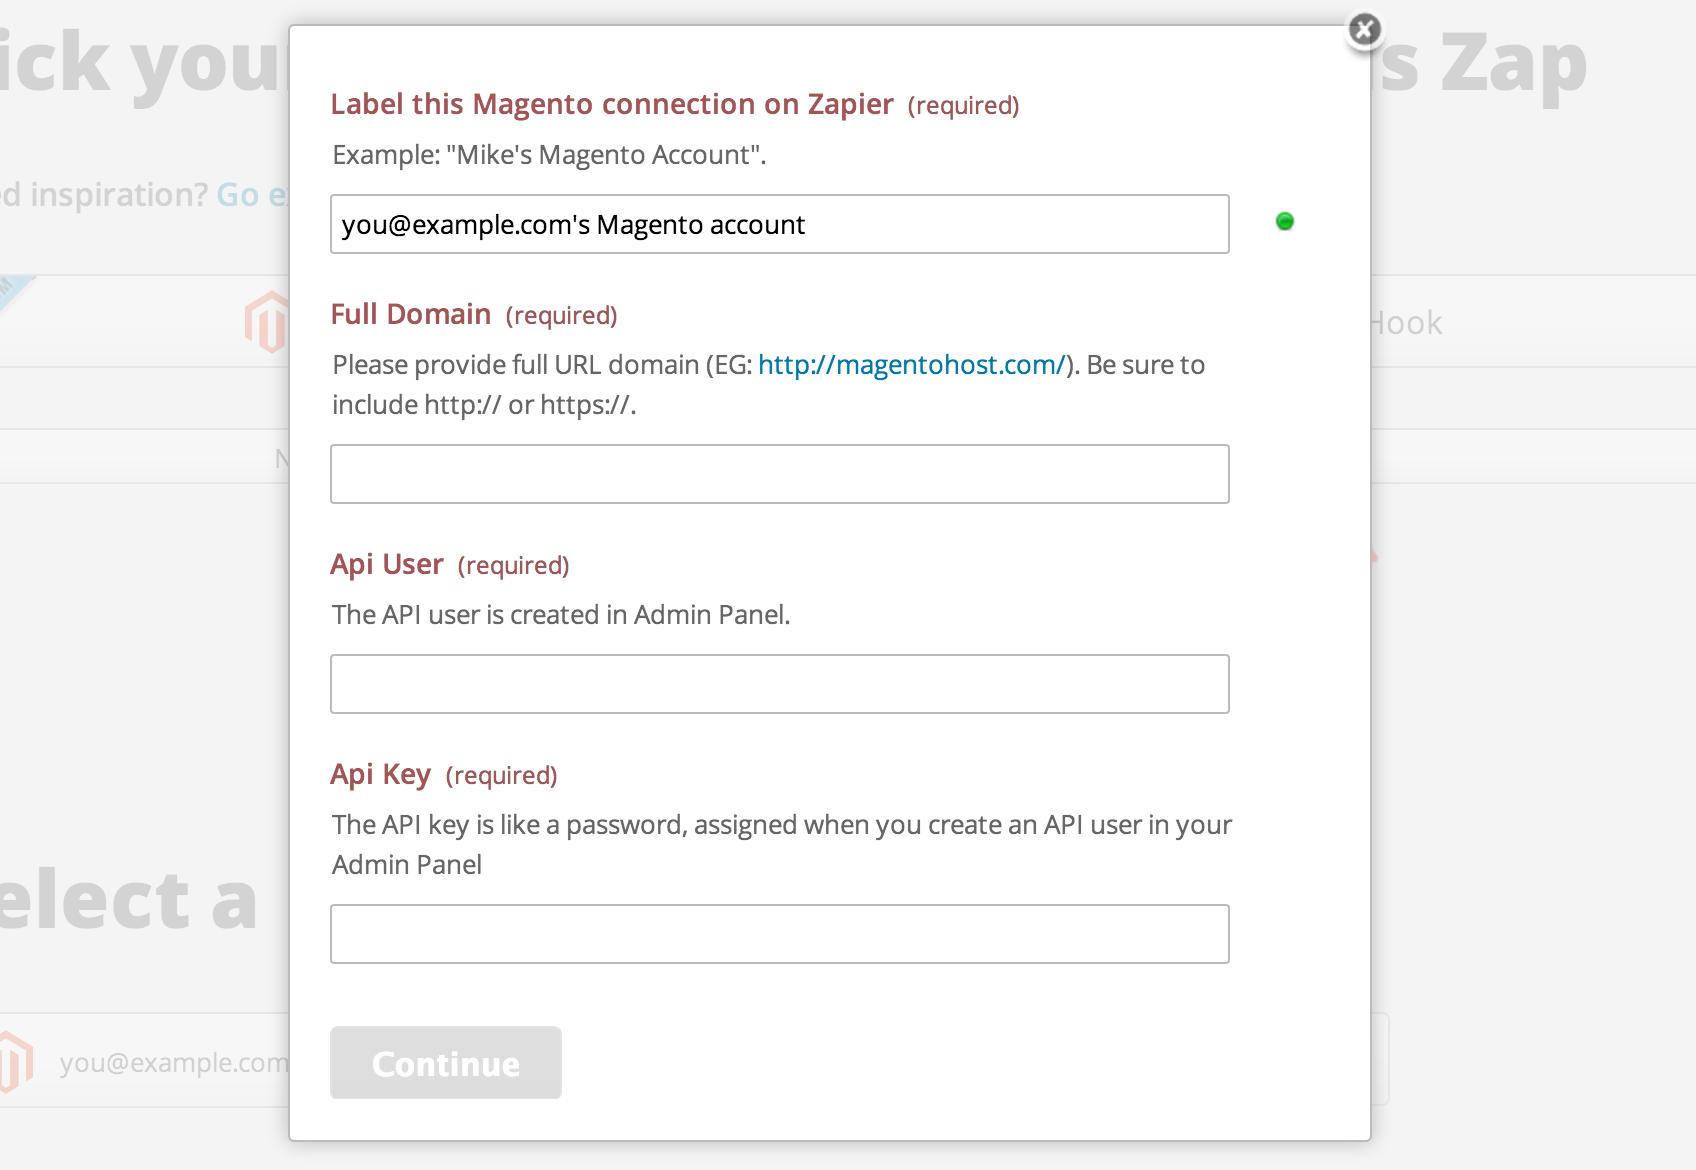 Magento - Integration Help & Support | Zapier